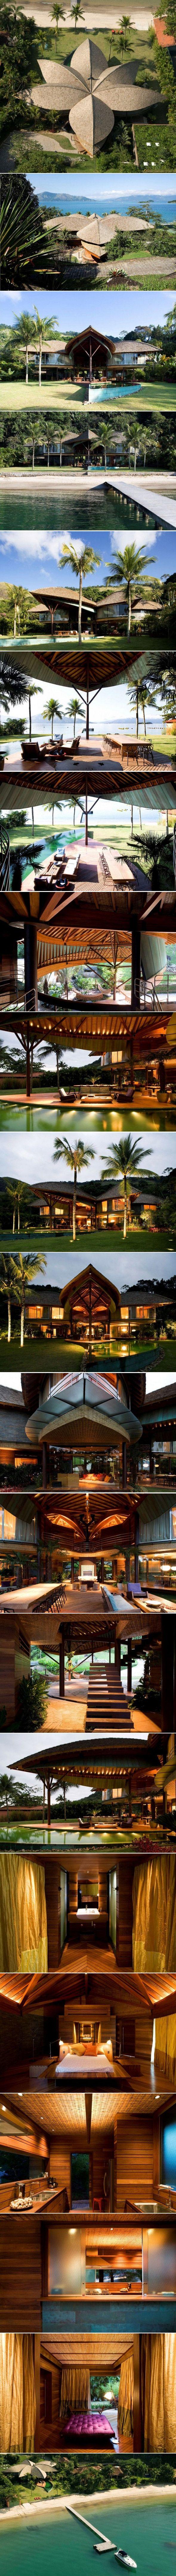 Leaf House by Mareines + Patalano Arquitetura. Brazil